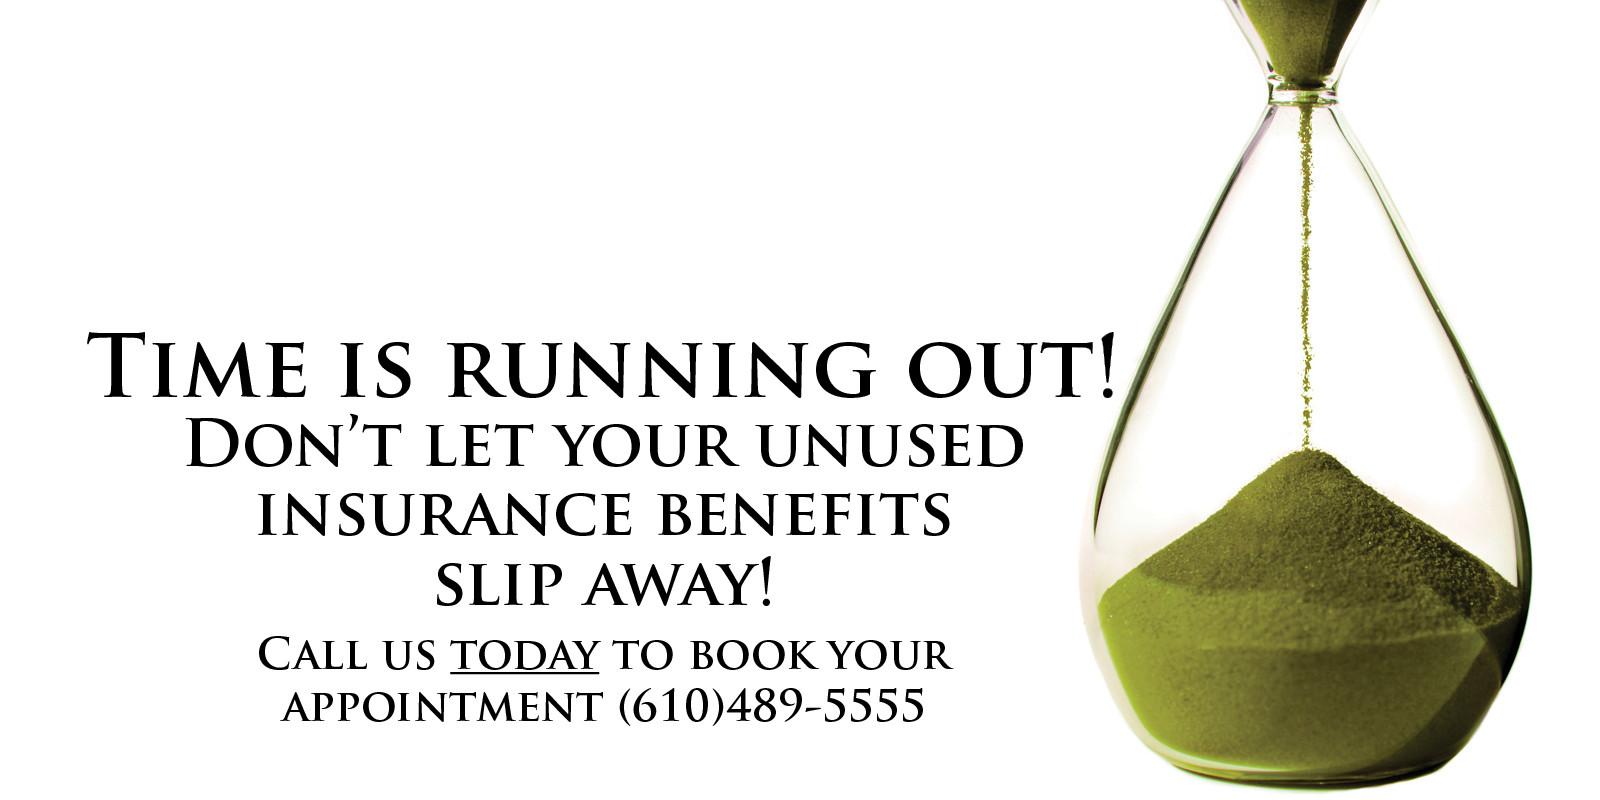 advanced-dentistry-of-collegeville-unused-dental-benefits-2